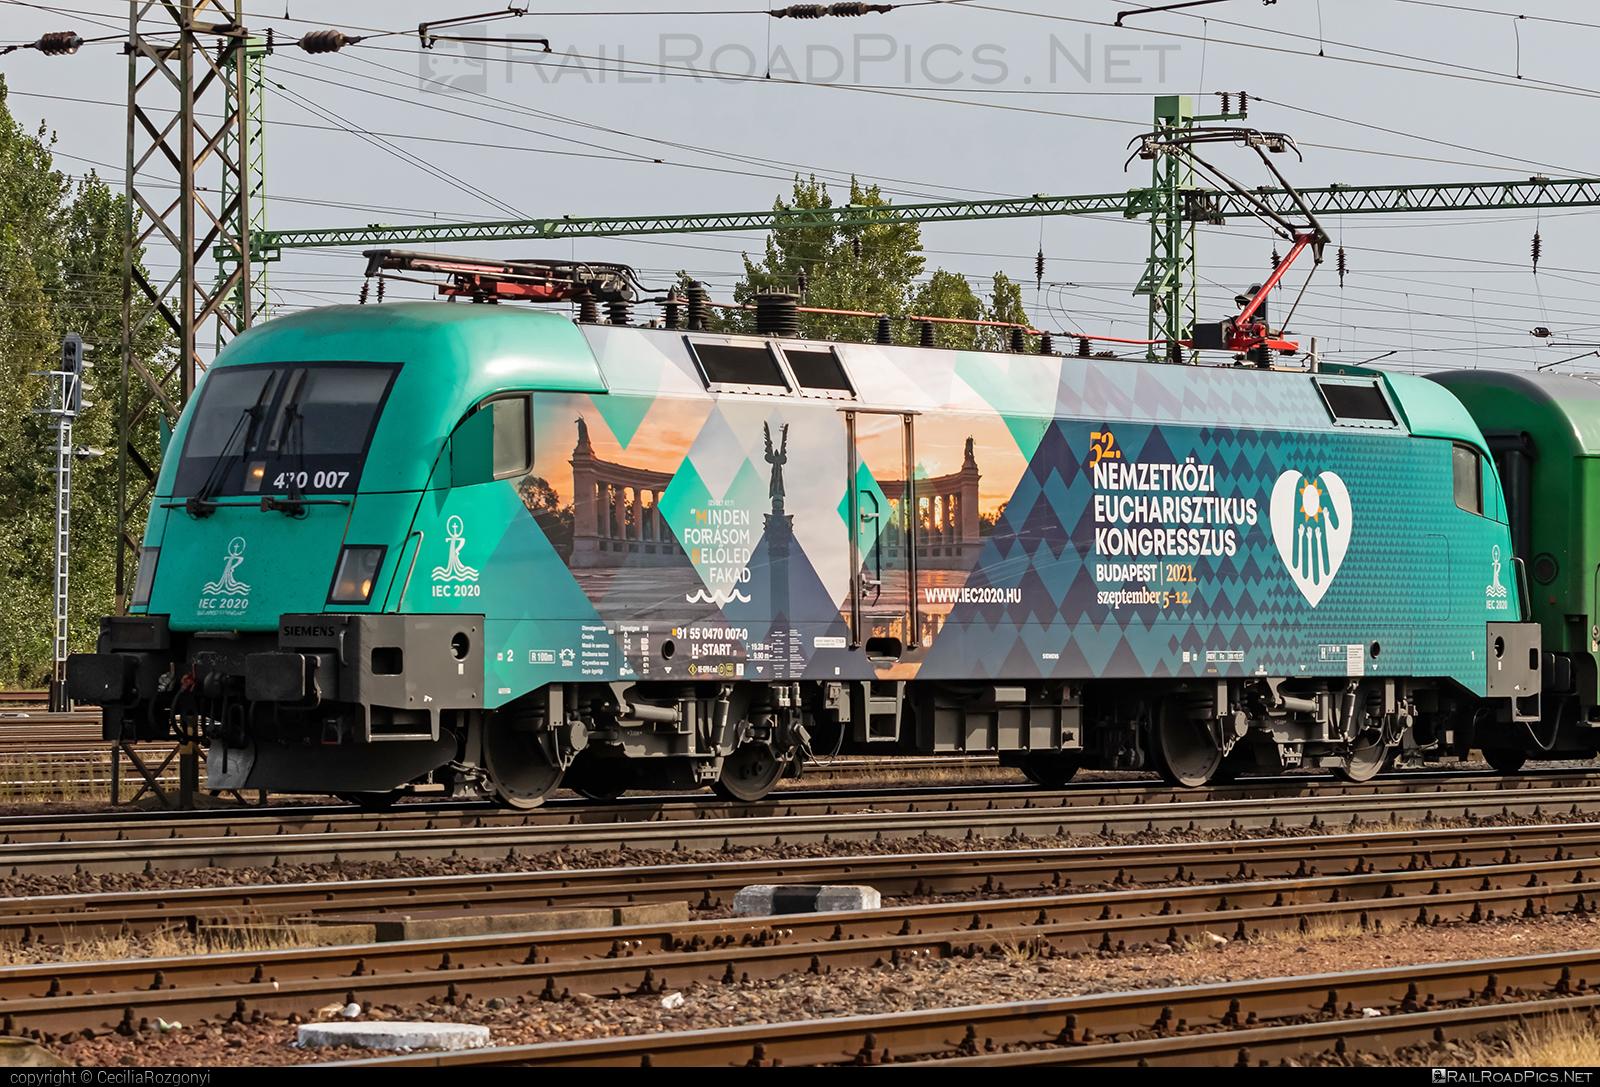 Siemens ES 64 U2 - 470 007 operated by MÁV-START ZRt. #es64 #es64u #es64u2 #eurosprinter #mav #mavstart #mavstartzrt #siemens #siemenses64 #siemenses64u #siemenses64u2 #siemenstaurus #tauruslocomotive